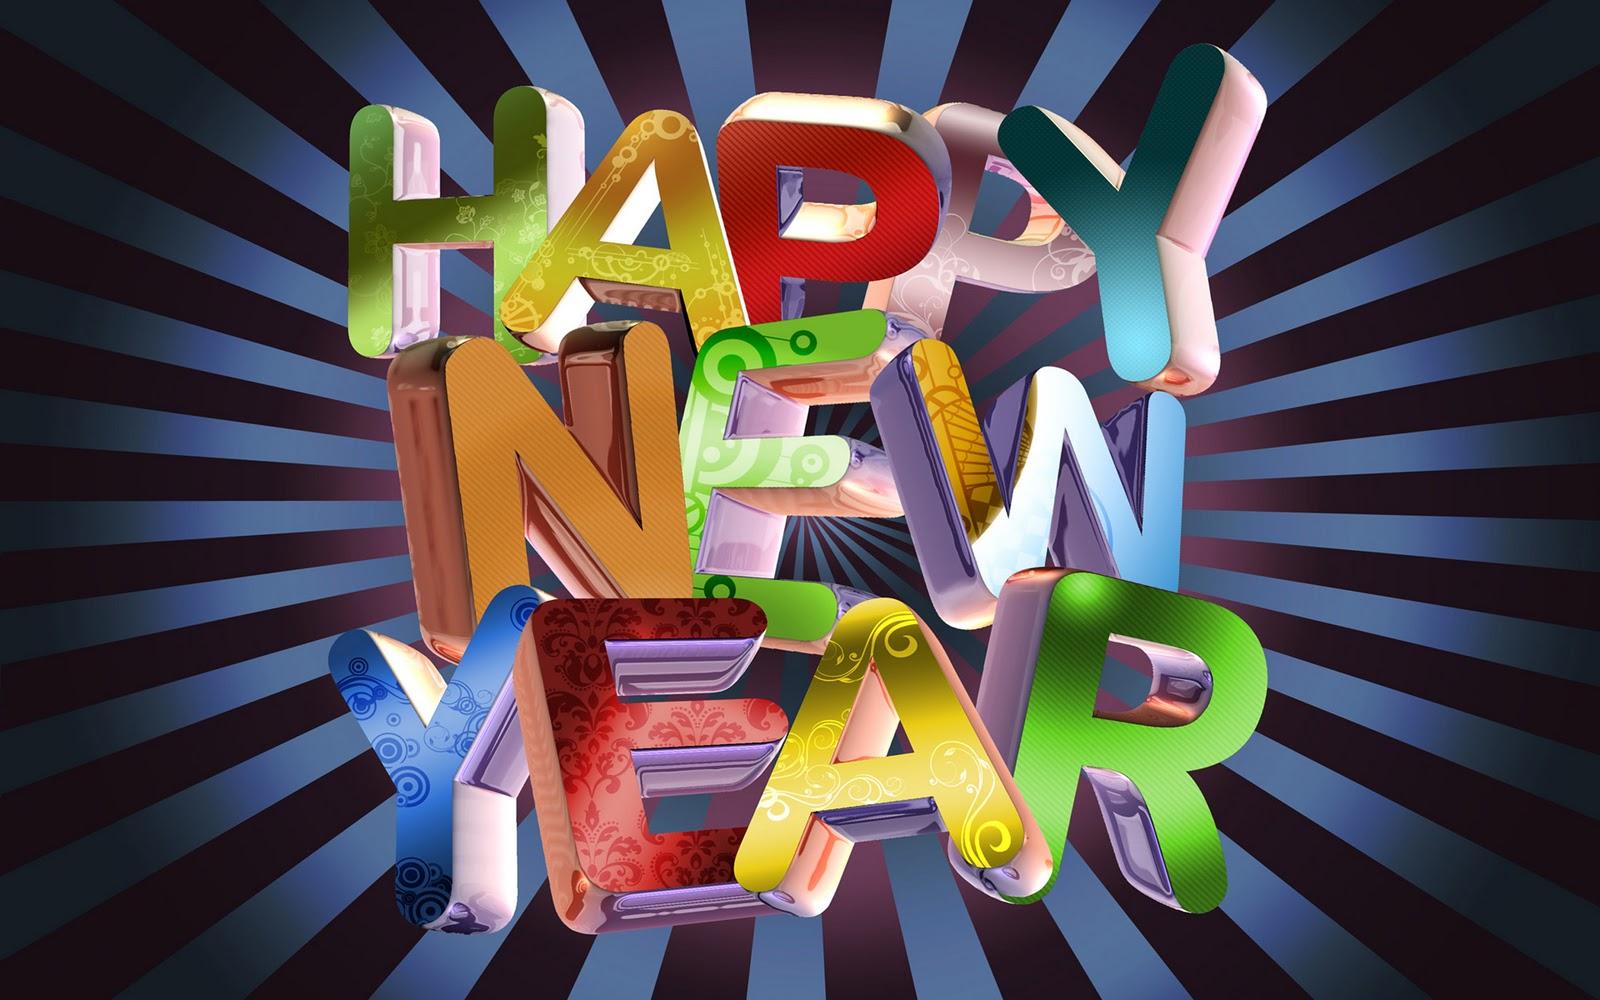 http://3.bp.blogspot.com/_JVxNY44i-ec/TR9SSrY5YGI/AAAAAAAAACE/T08JGGARqOE/s1600/Happy_New_Year_Artistic%255B1%255D.jpg